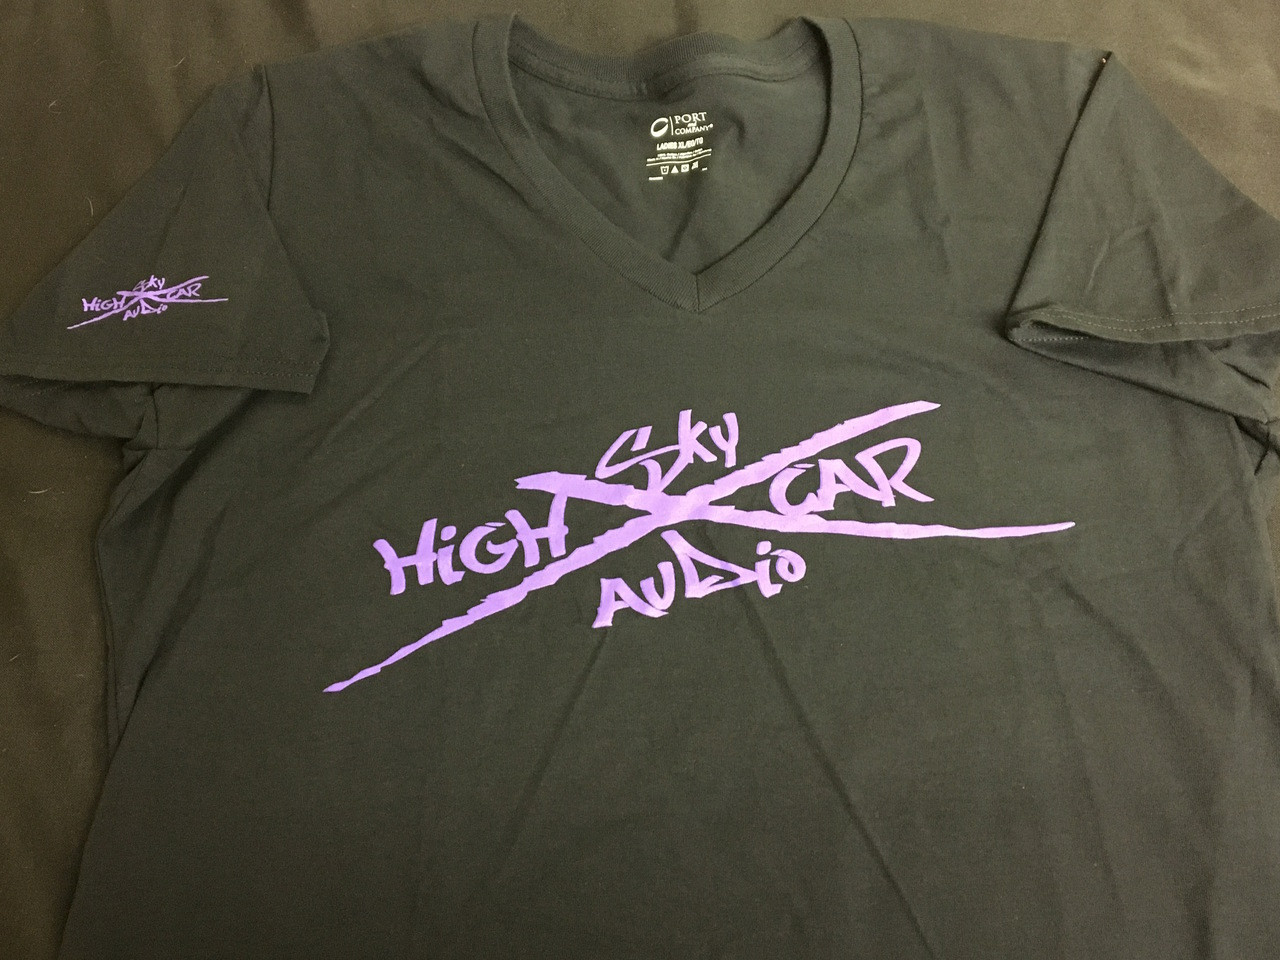 SHCA Female X Logo T-Shirt Black w/ Purple Logo